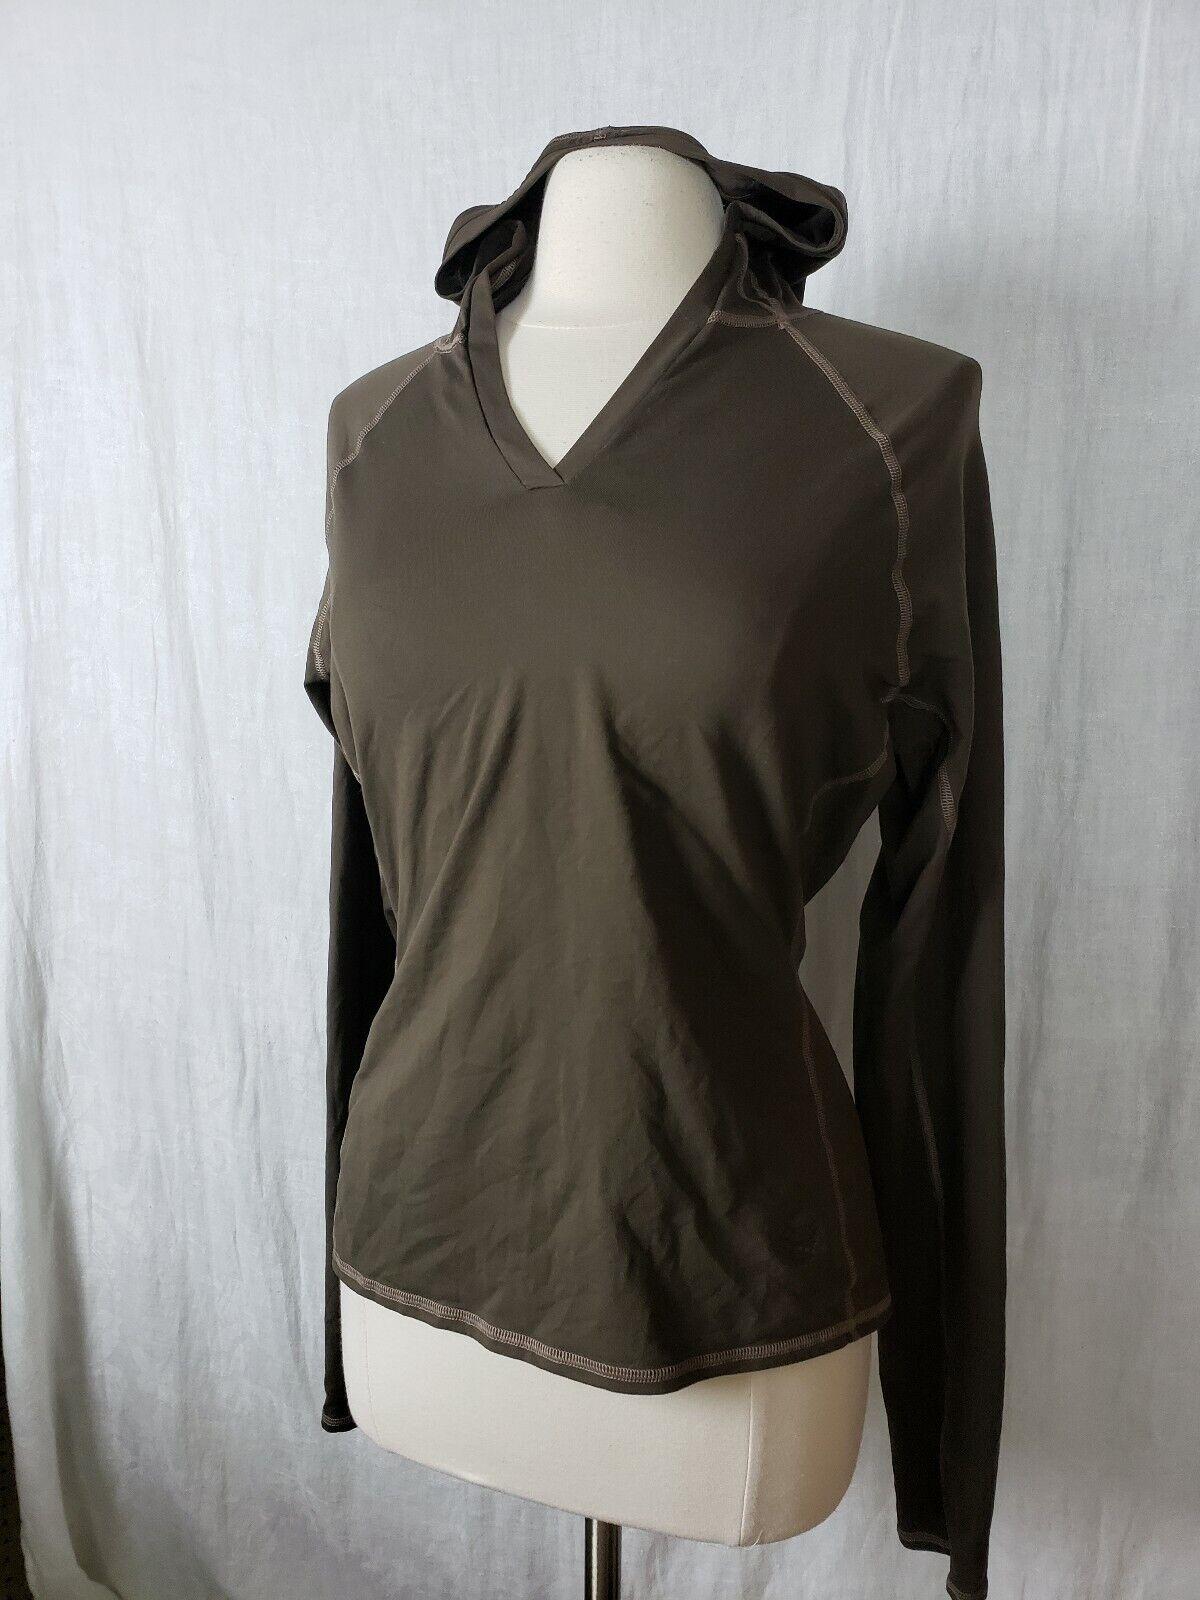 Mountain Hardwear V-Neck Hooded Shirt Size Womens Sz M Brown Long Sleeve